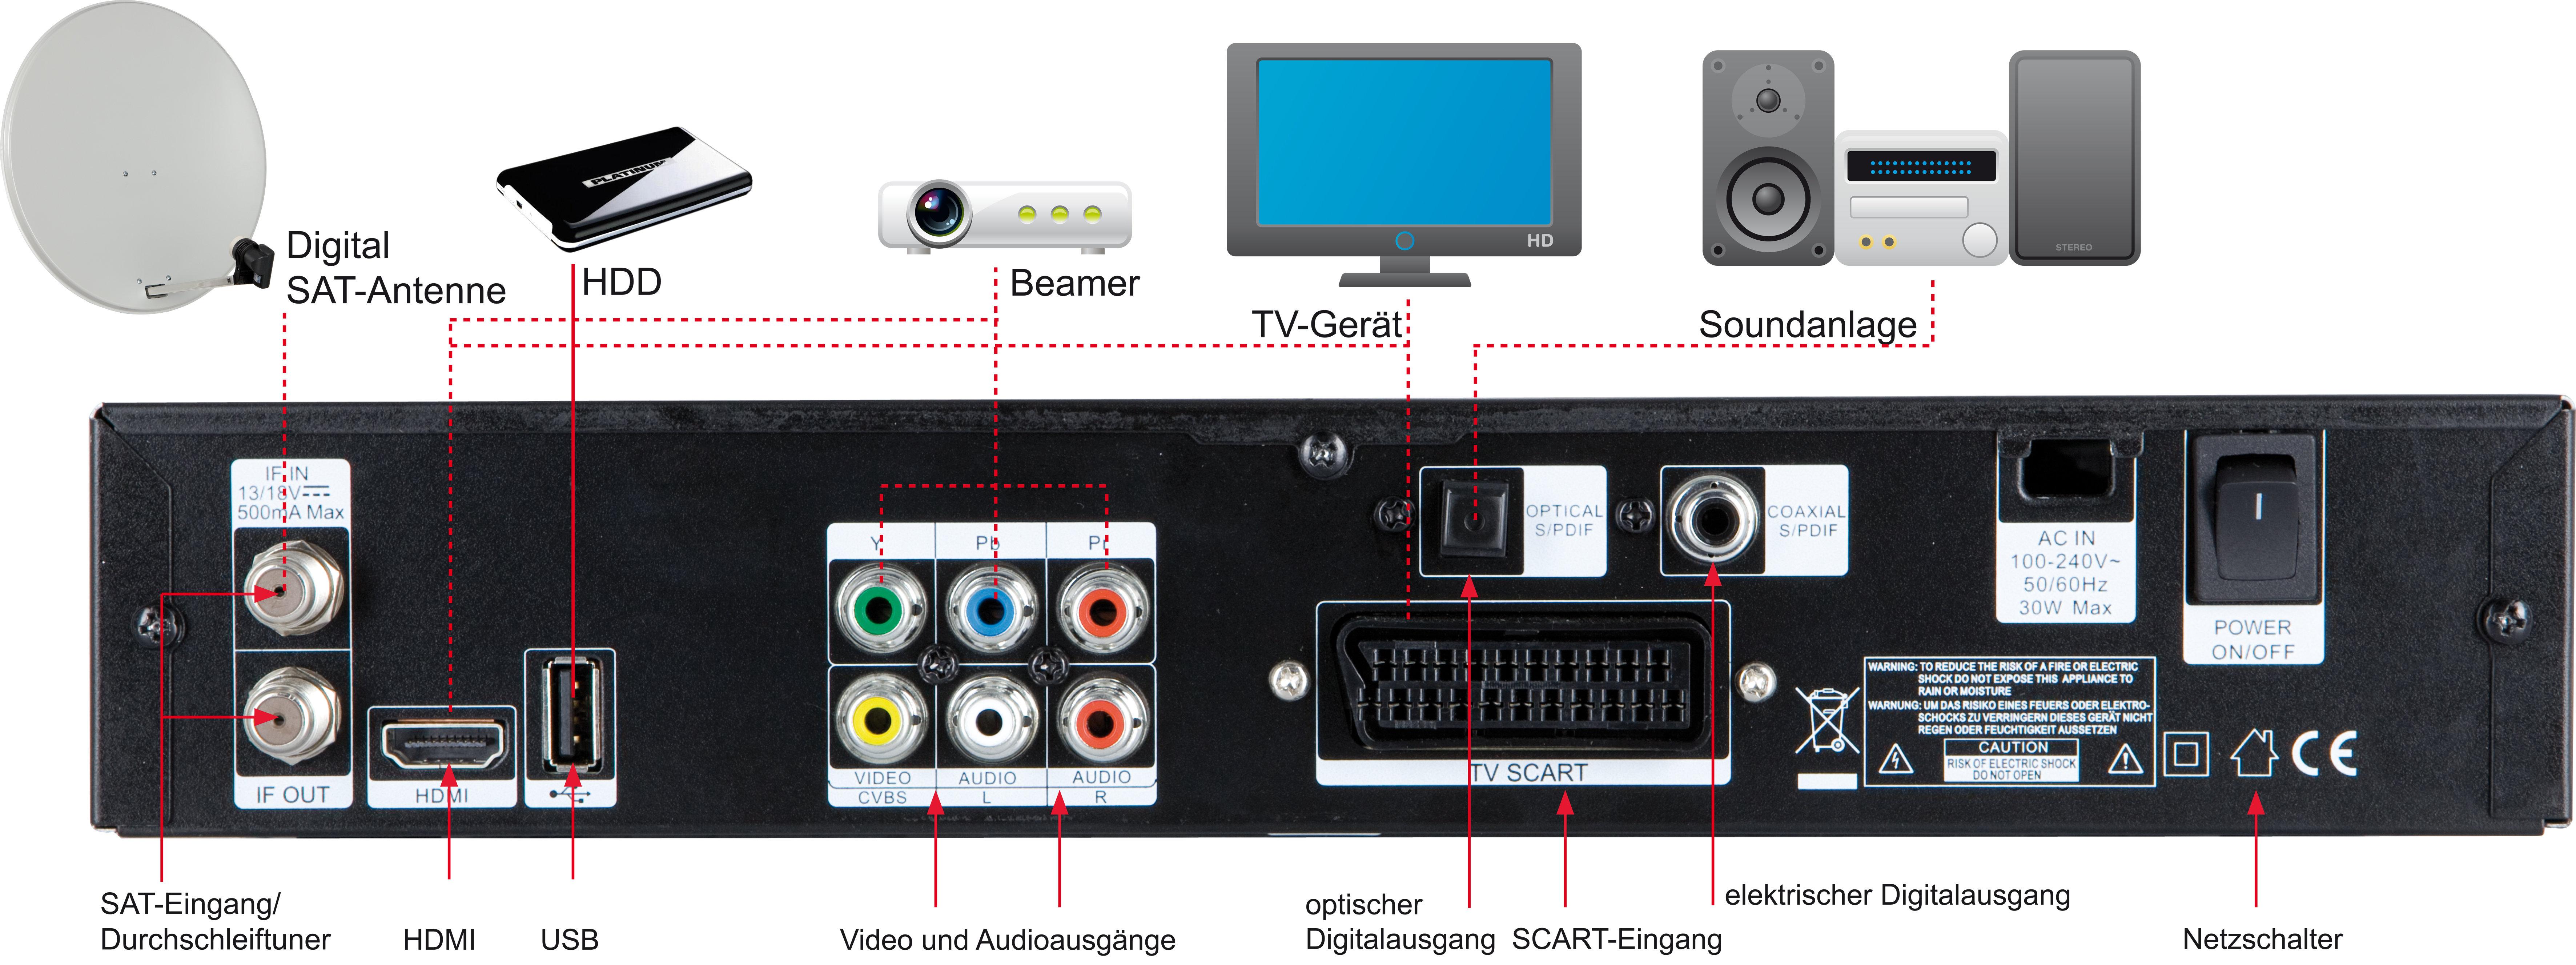 Digitalbox Imperial HD 3-K Digitaler HDTV Kabelreceiver